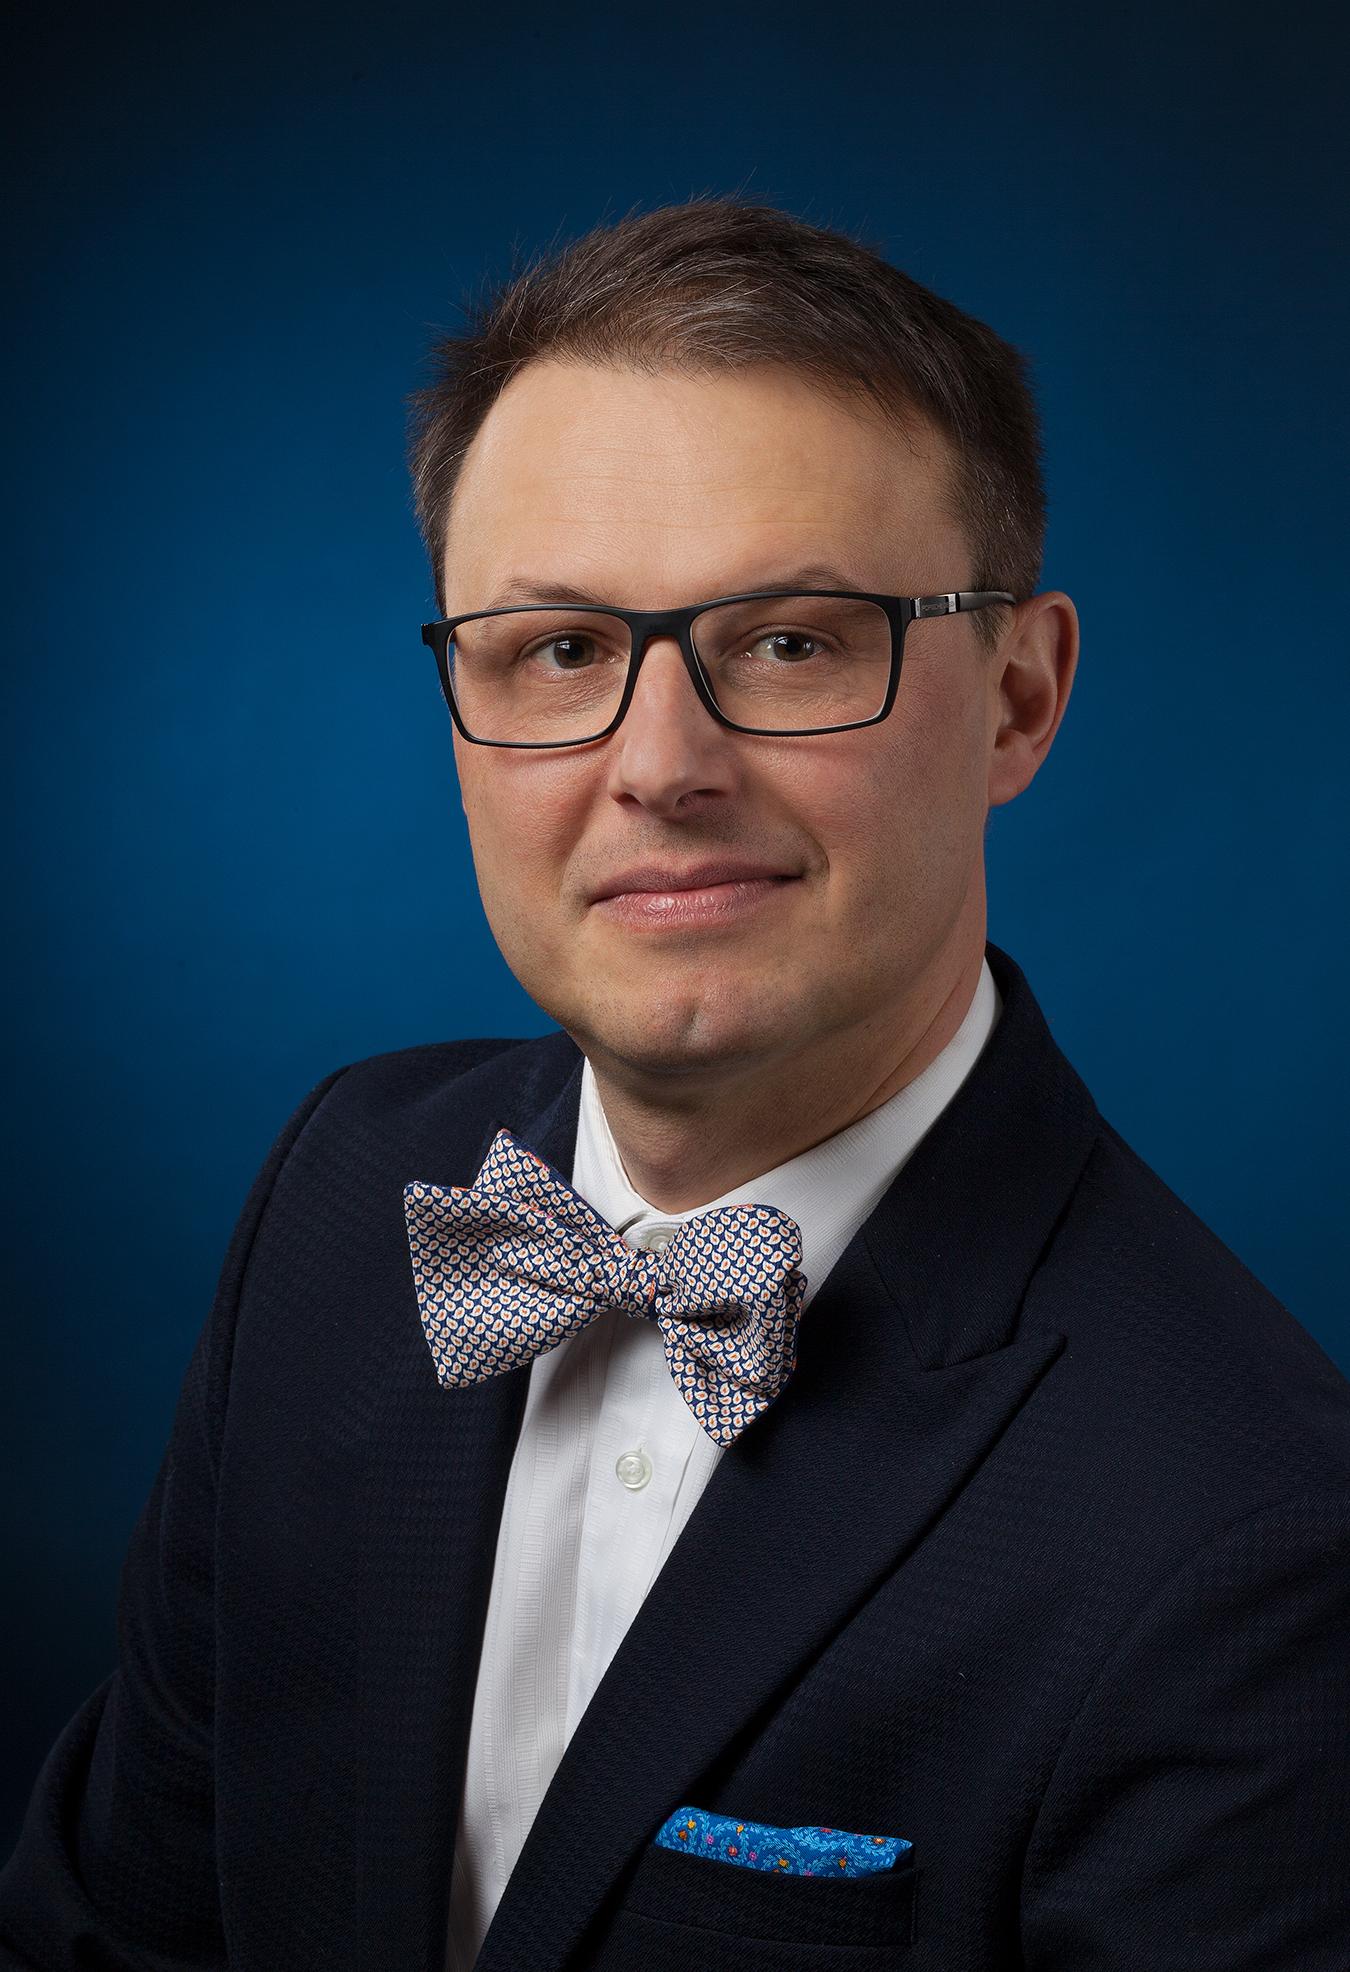 Dr. David Ponka